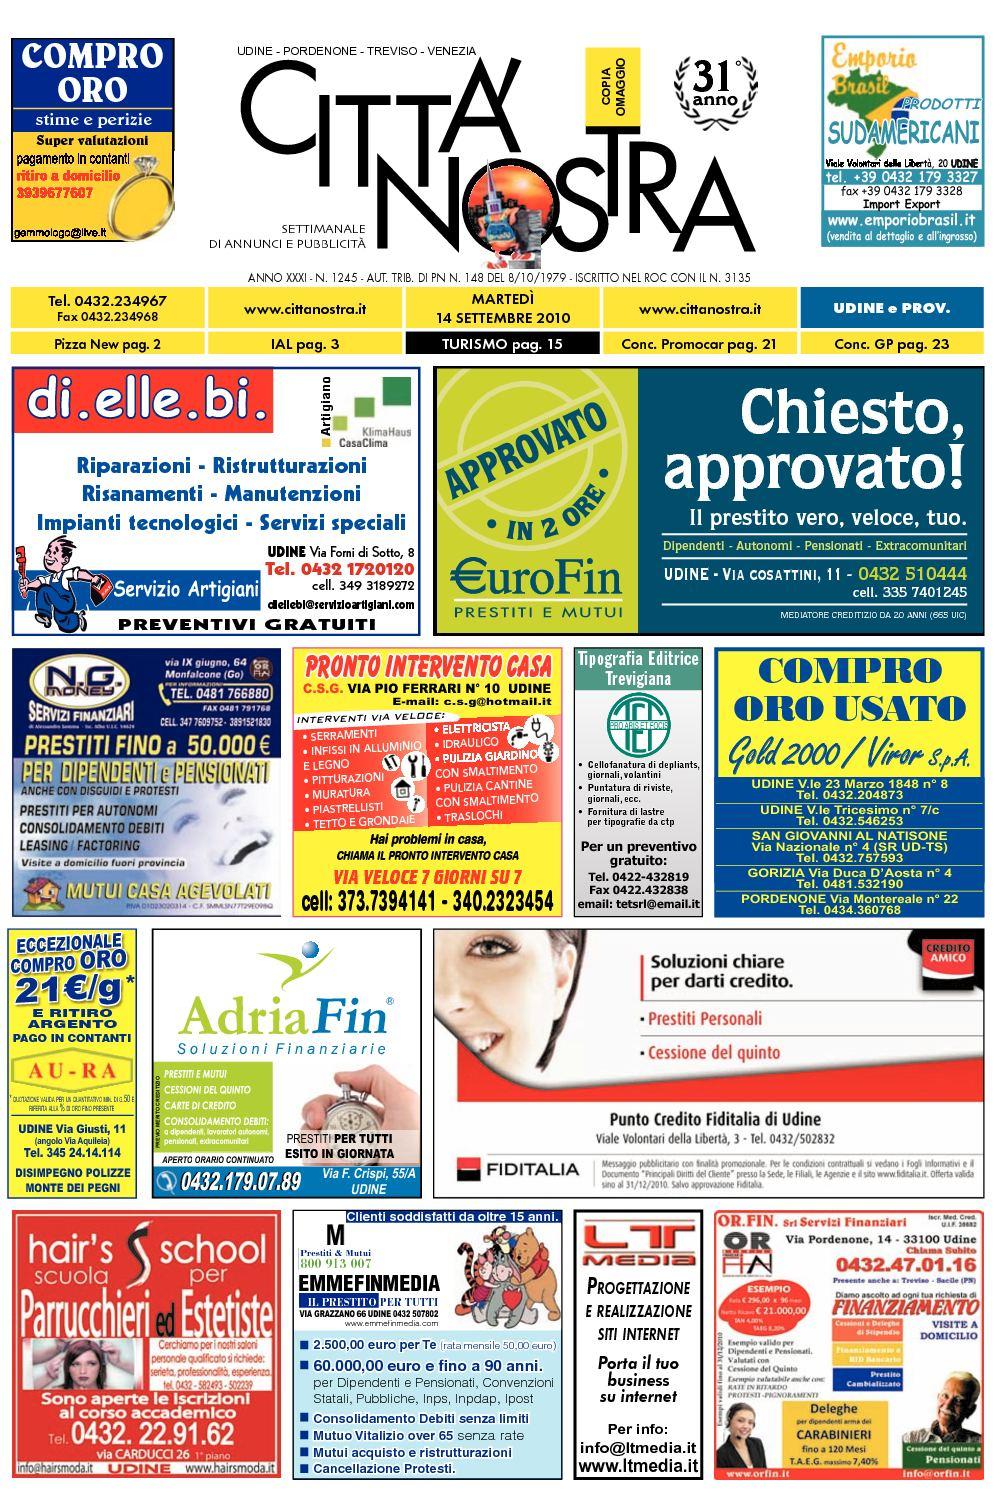 Best Mobili Usati Udine Images - harrop.us - harrop.us